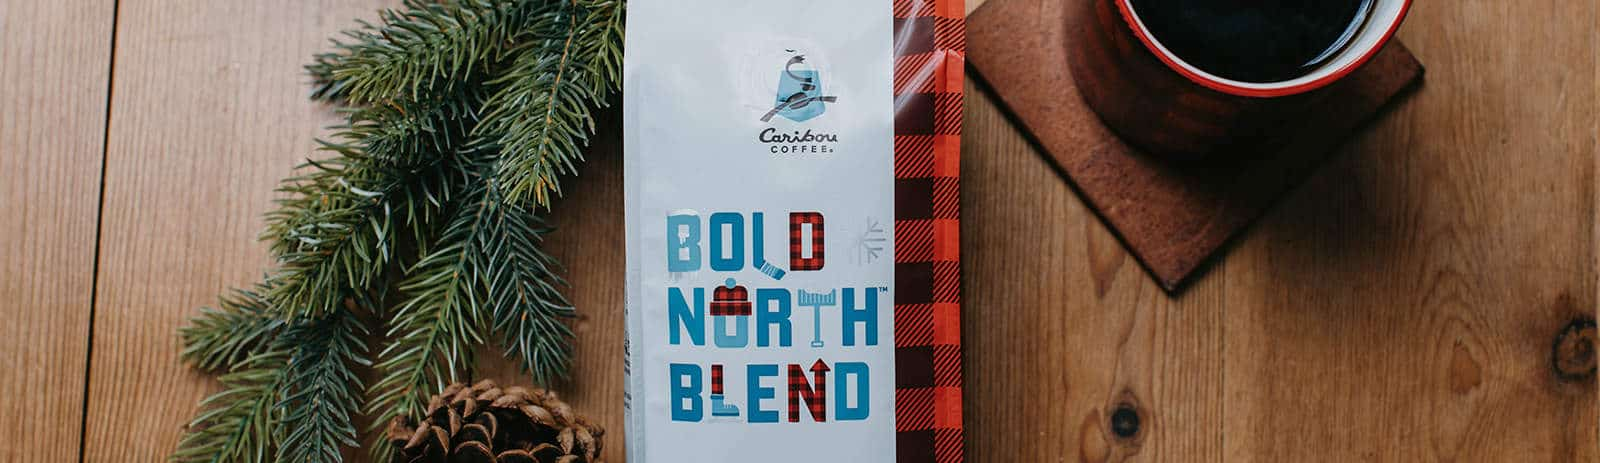 Coffee Pg Bold North Blend Slider